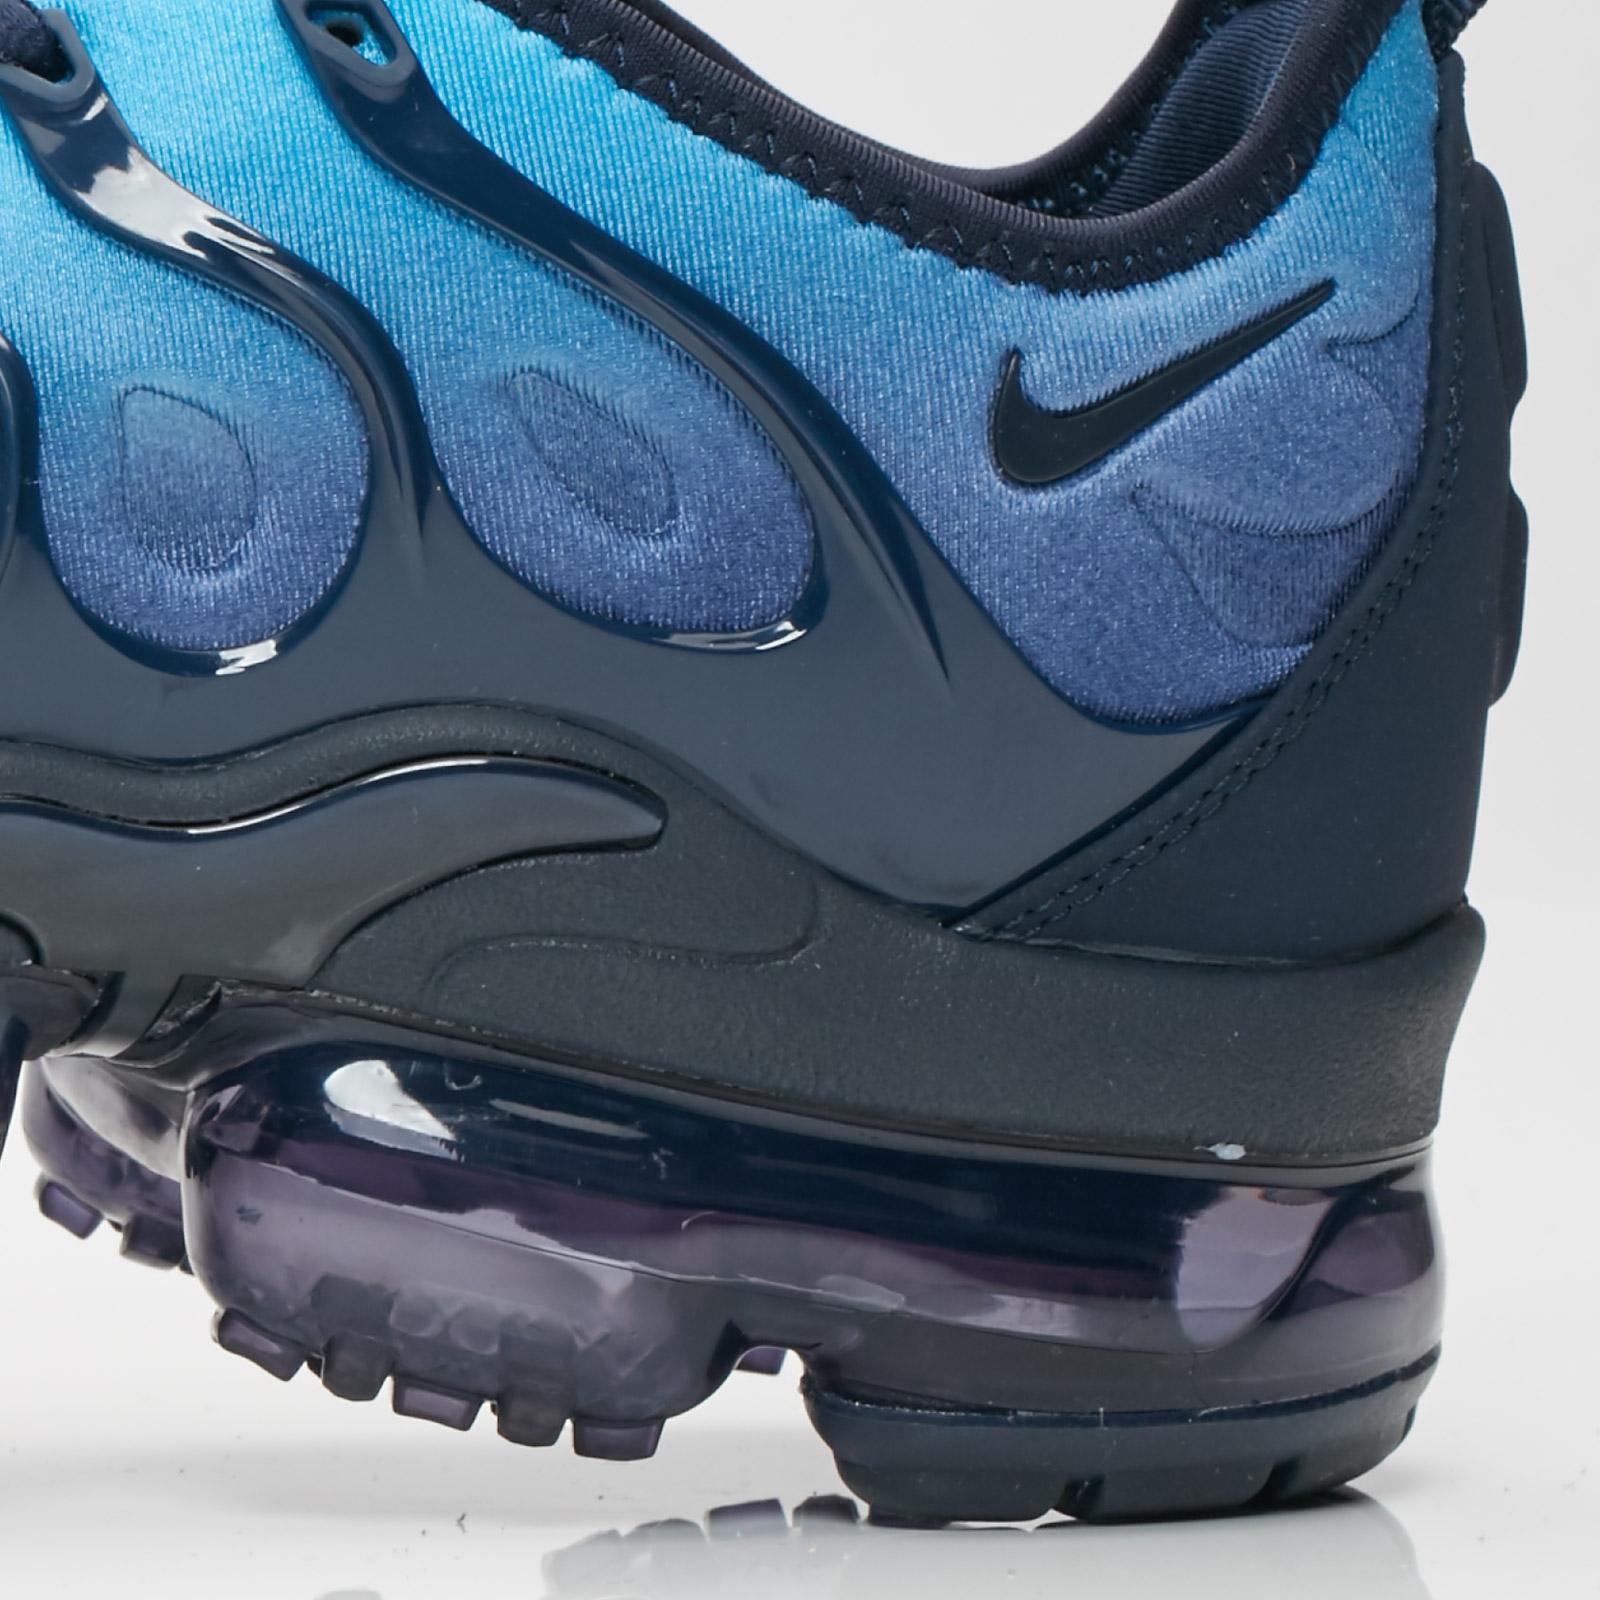 3efb2dc6543ec Nike Air Vapormax Plus - 924453-401 - Sneakersnstuff